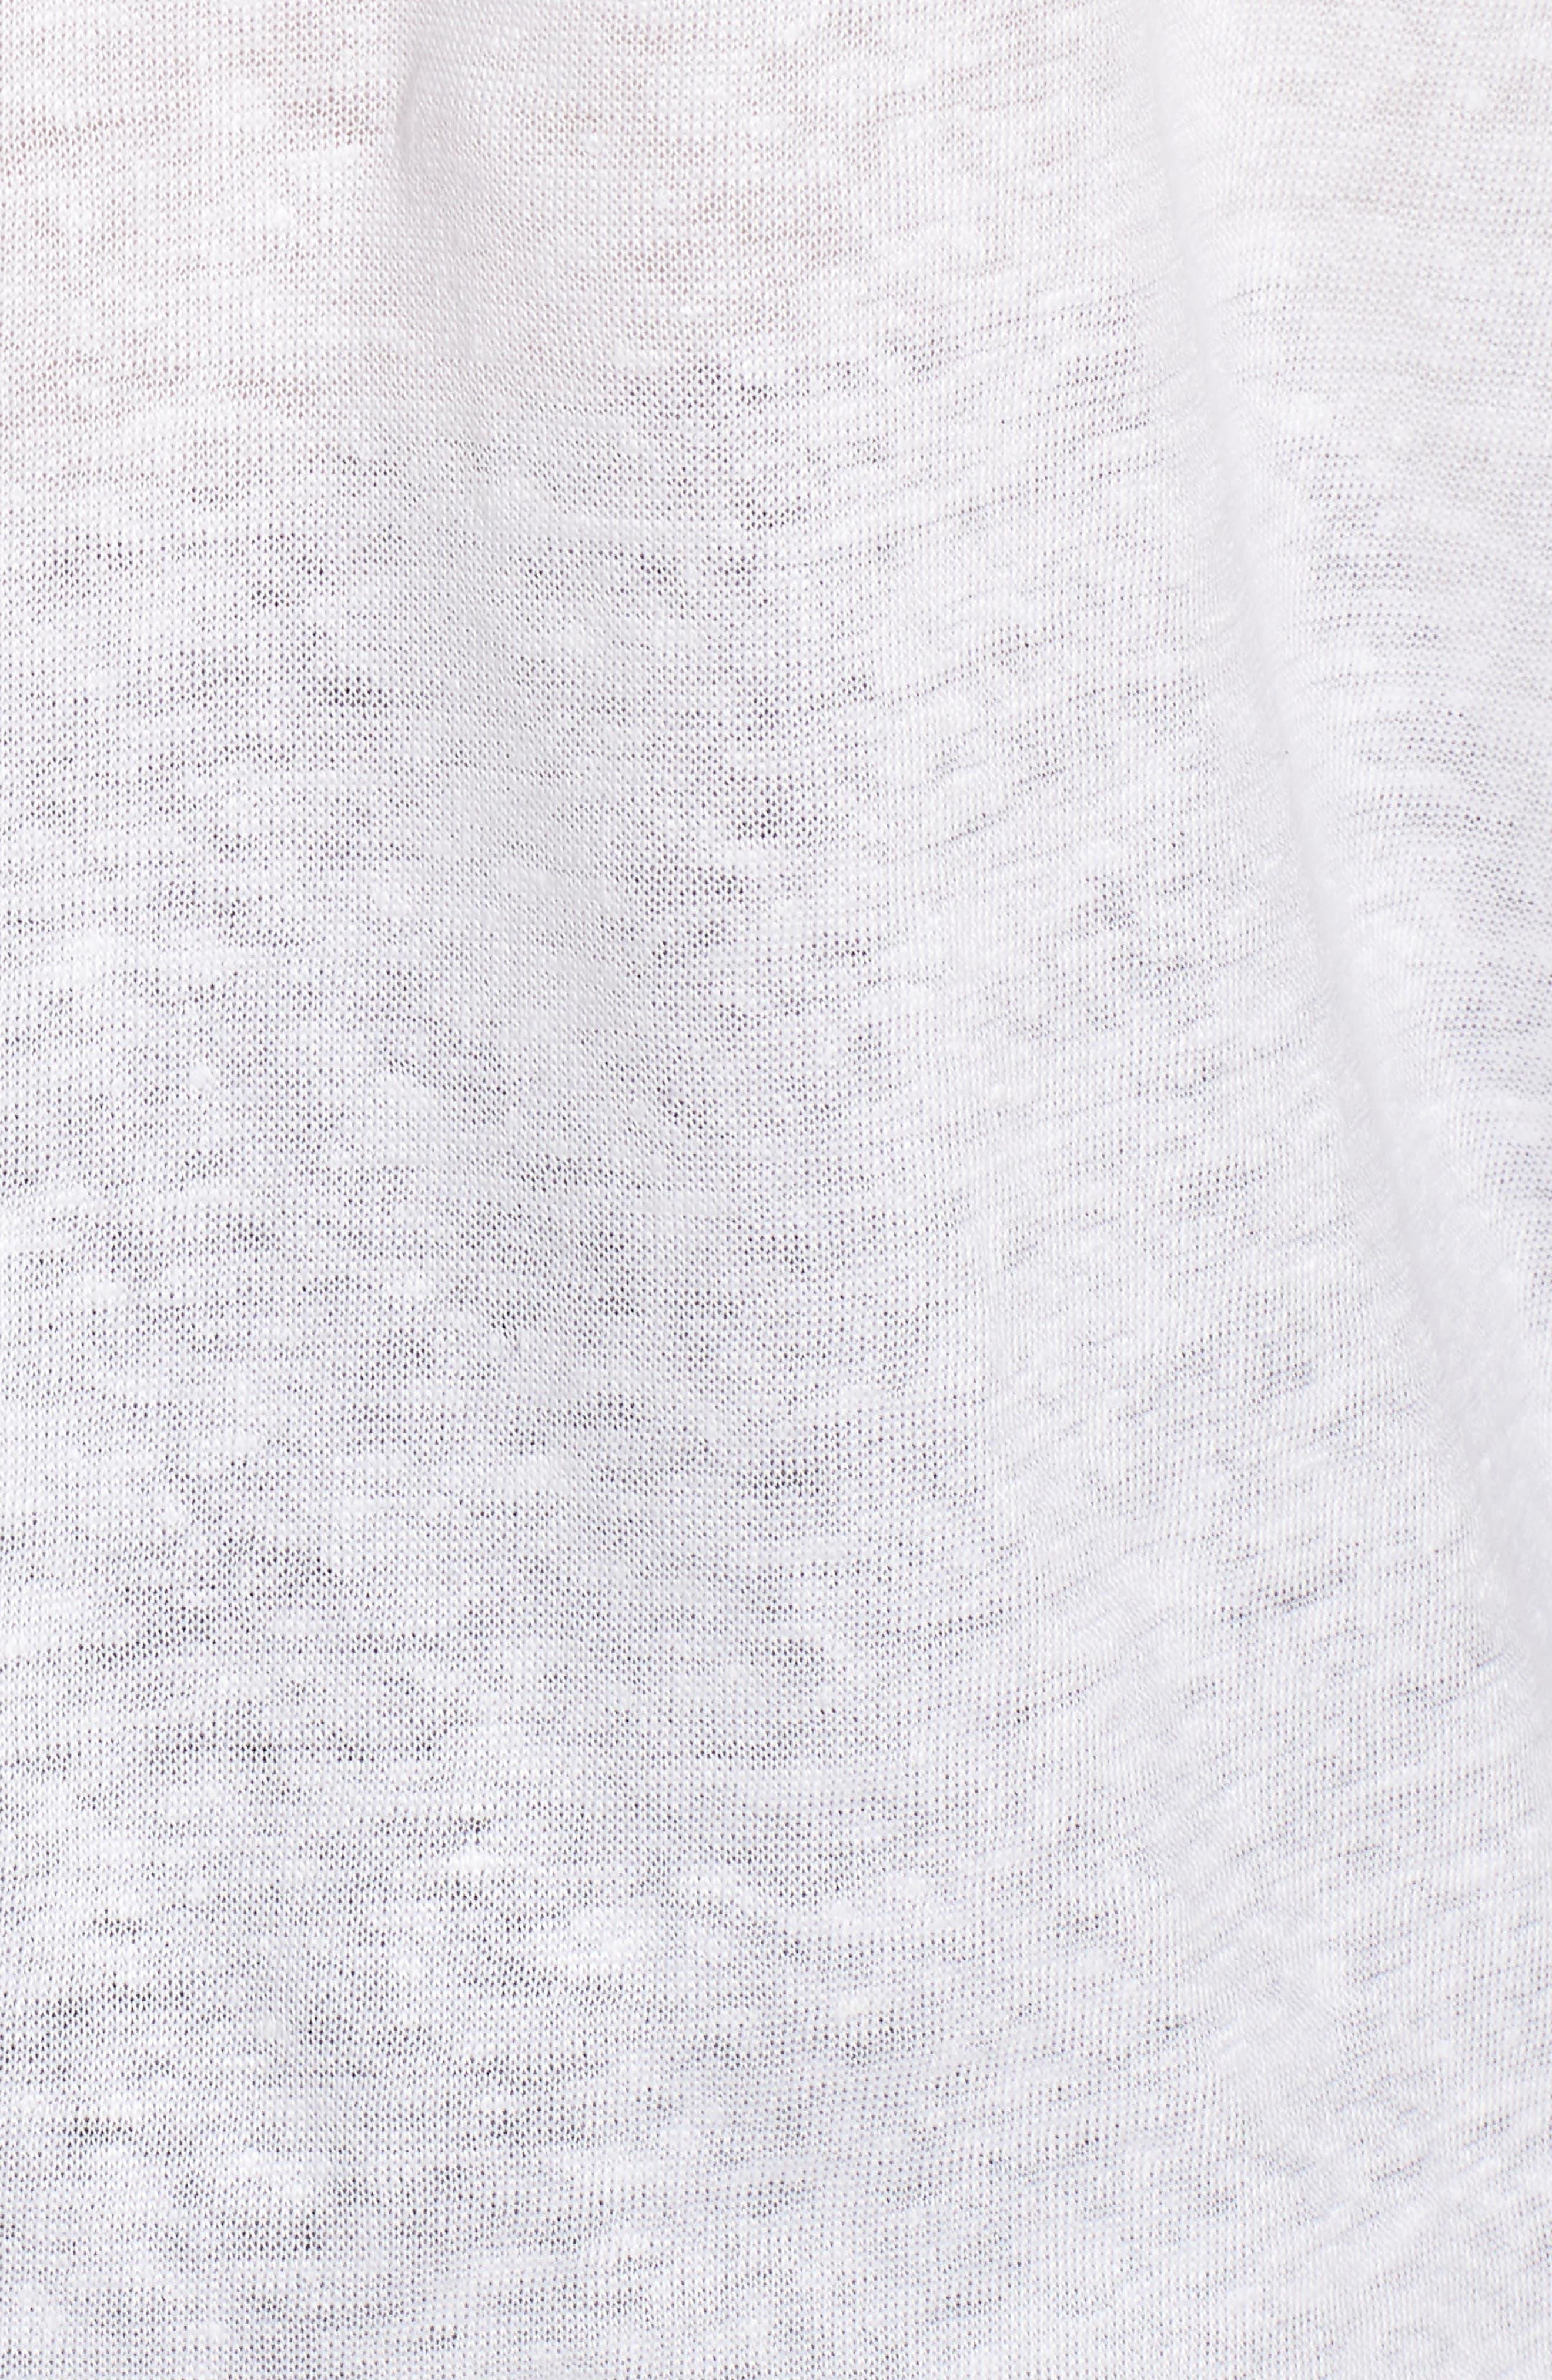 Knit Linen Hoodie,                             Alternate thumbnail 6, color,                             White